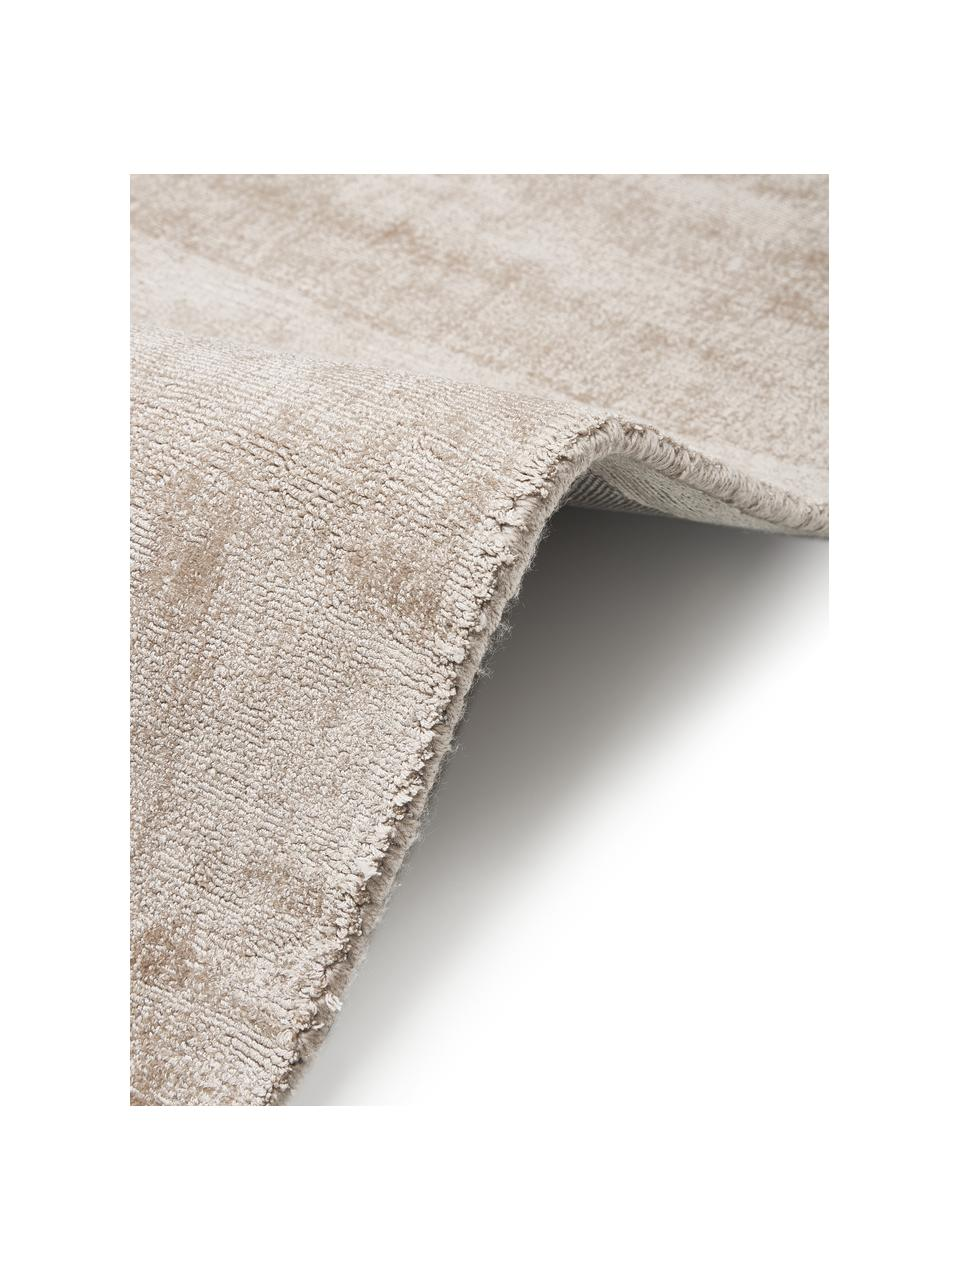 Passatoia in viscosa beige tessuta a mano Jane, Retro: 100% cotone, Beige, Larg. 80 x Lung. 250 cm